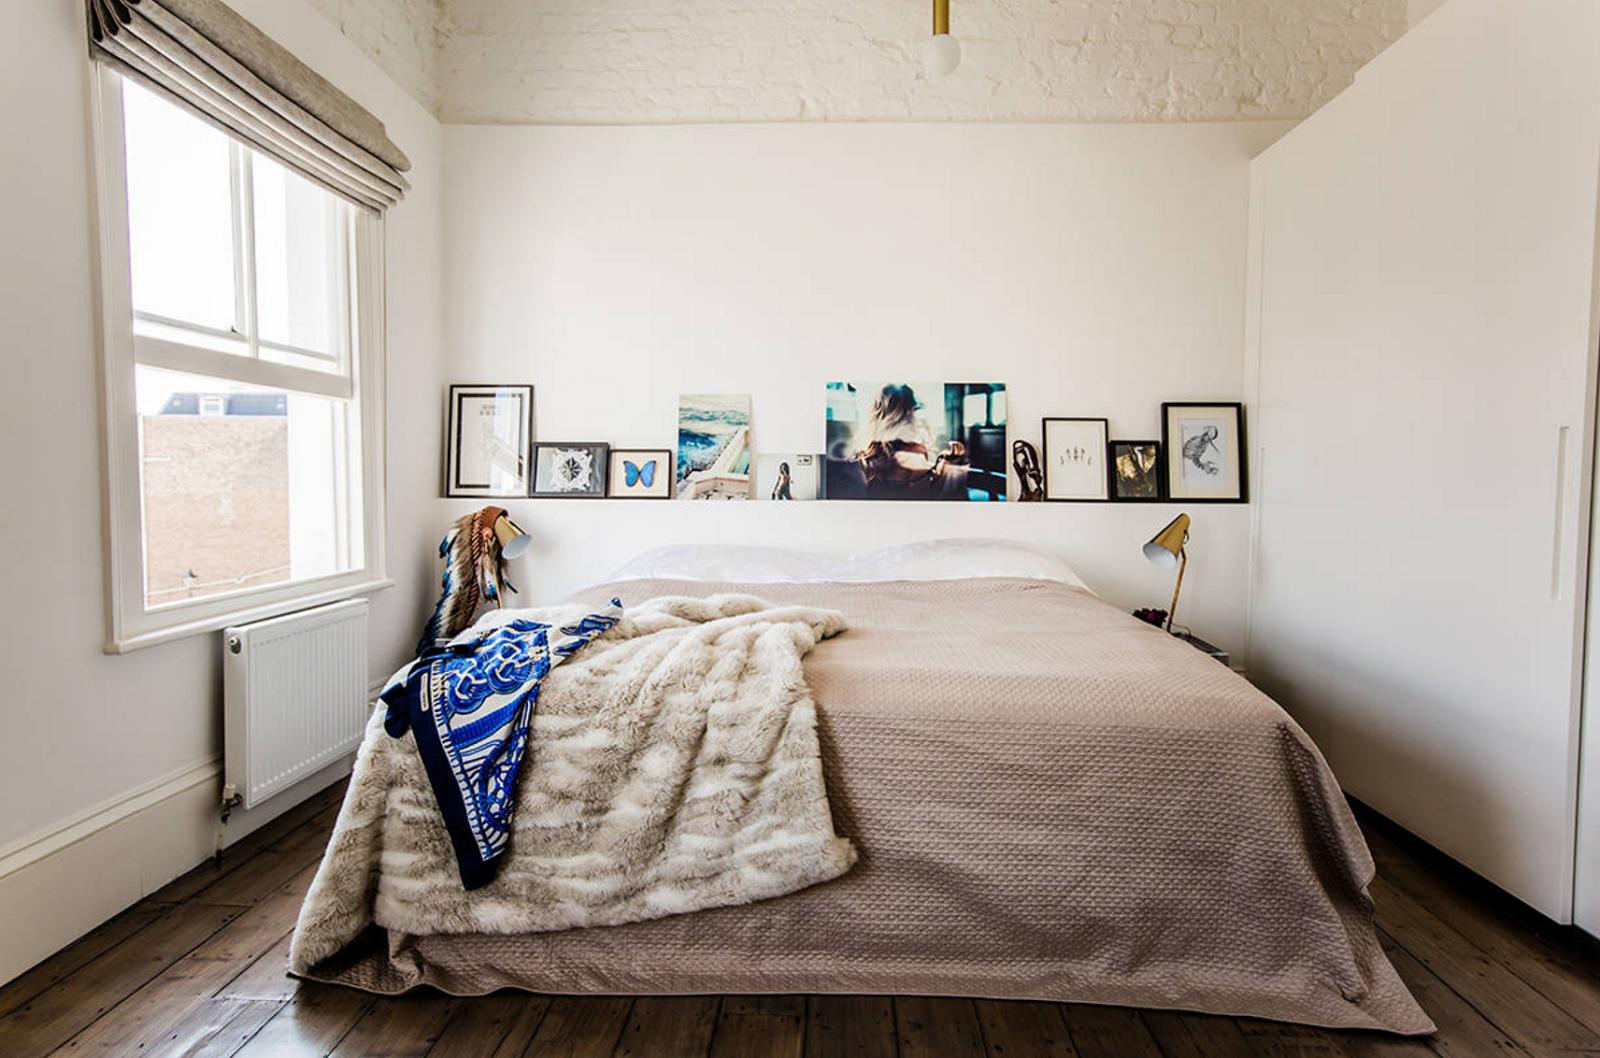 Desain Kamar Tidur Sempit Minimalis Sederhana Small Bedroom